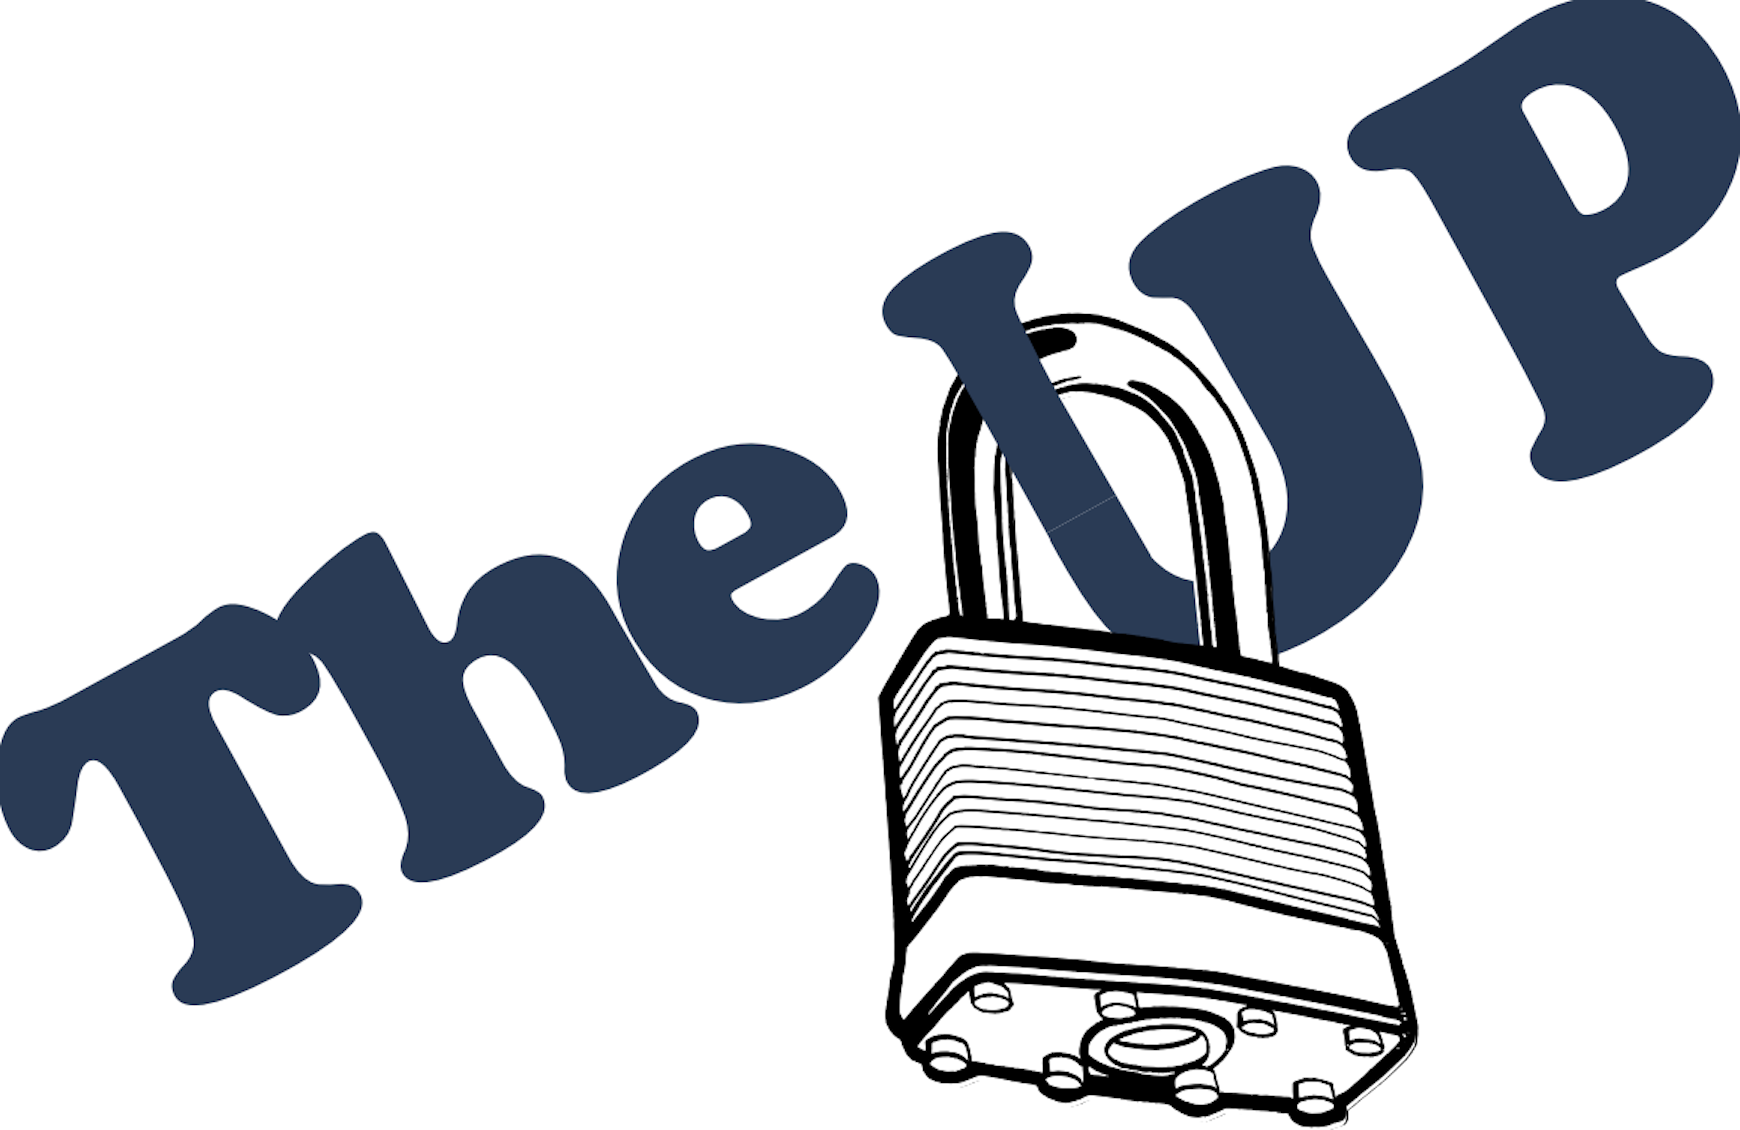 The Lockup Storage Services